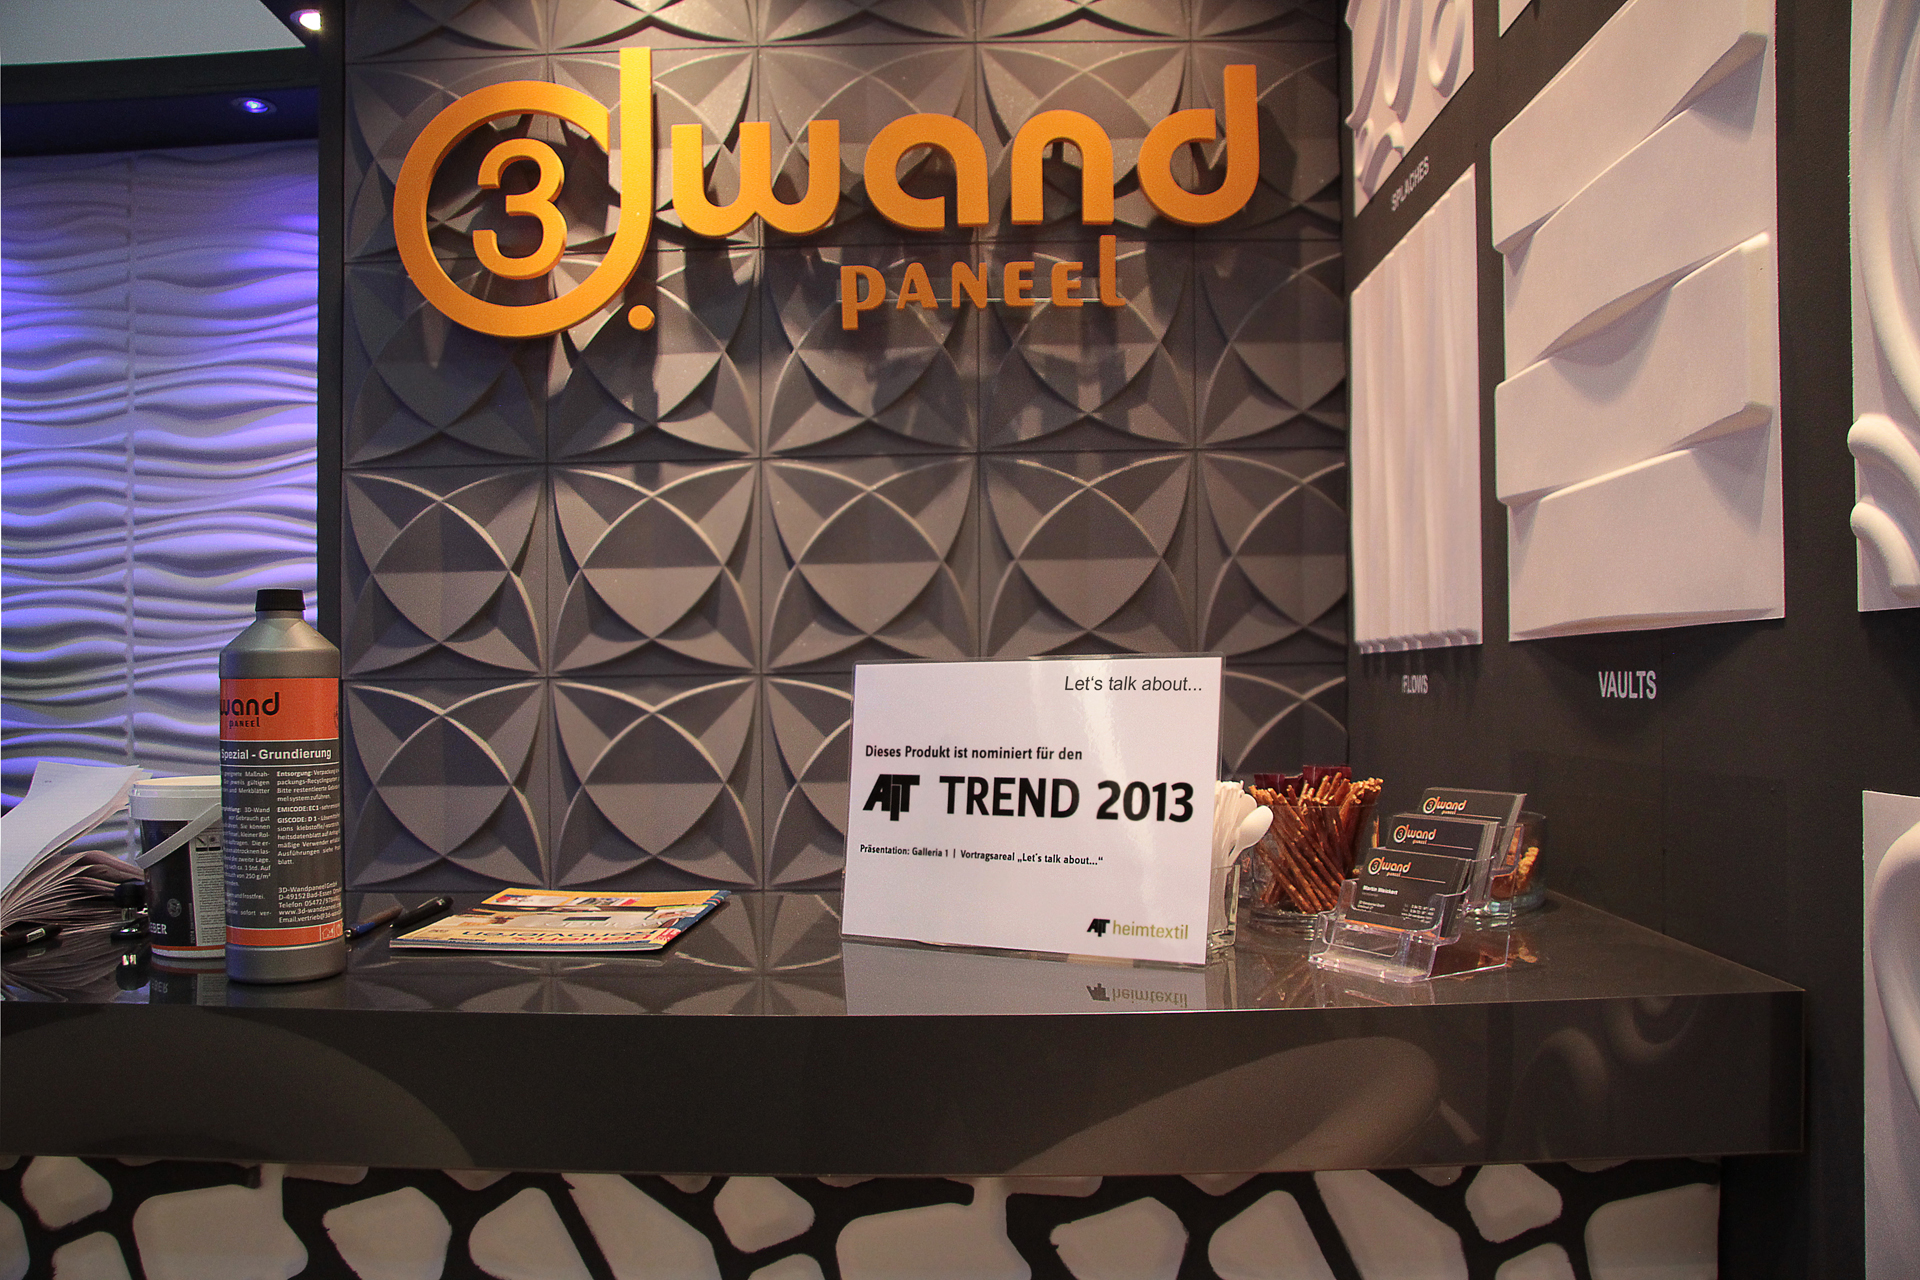 3D Wandpaneele - AIT TREND 2013 - Innovationspreis